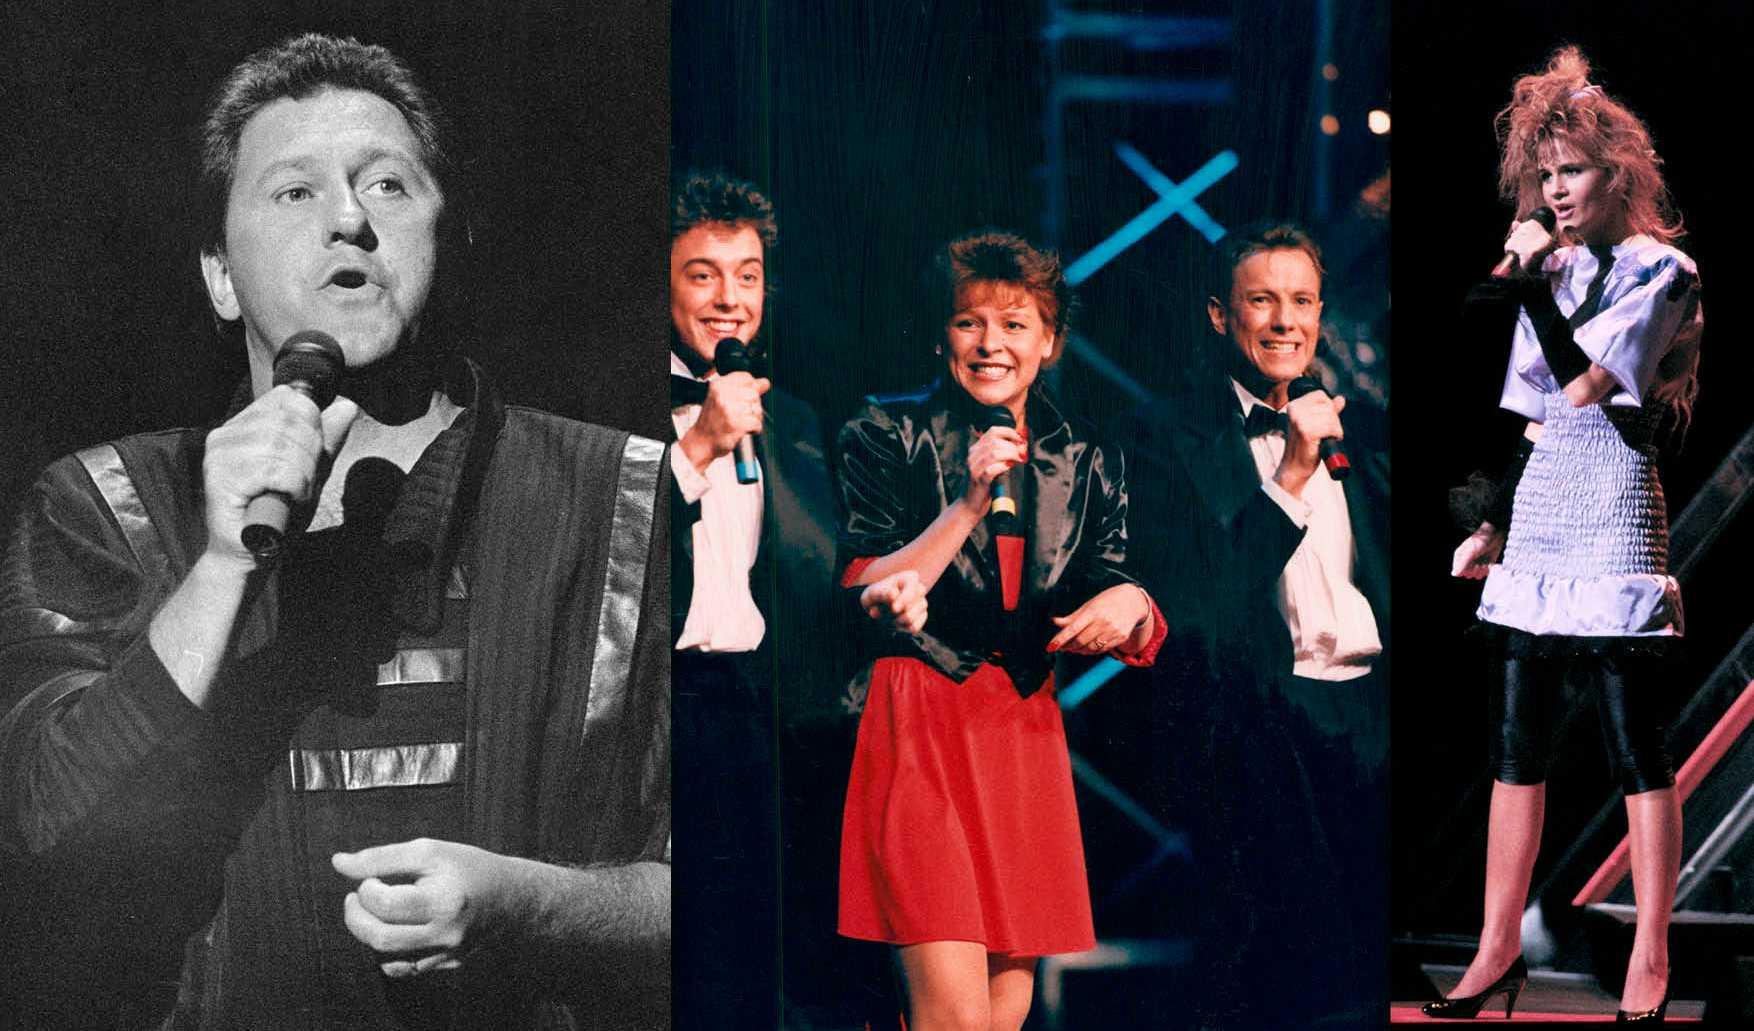 Tommy Körberg, Lotta Engberg, Lena Philipsson.